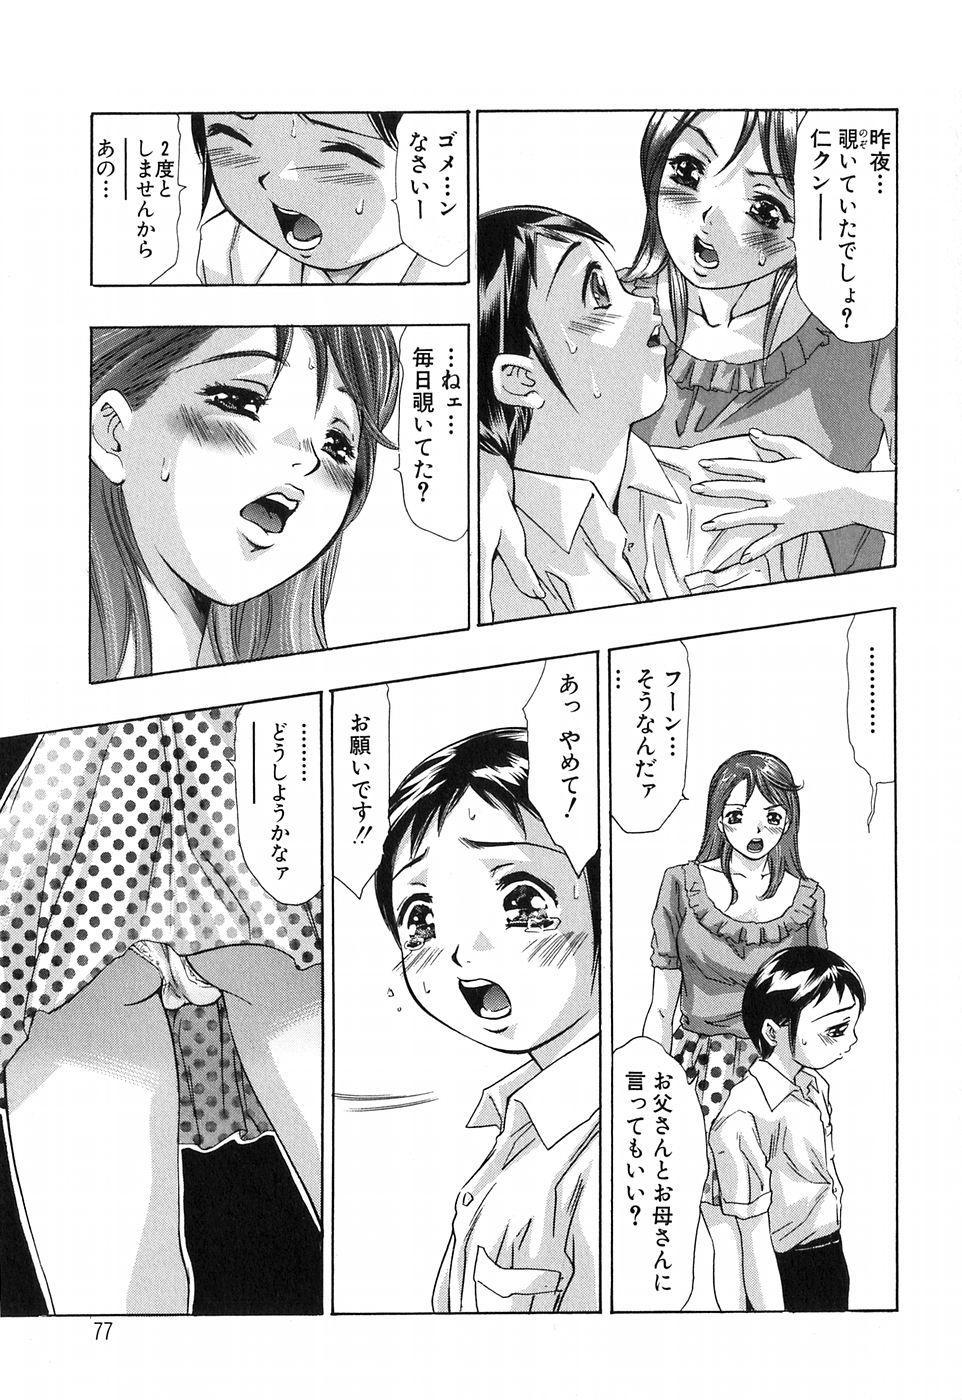 Uchi Naru Koe - Voice which becomes inside 76